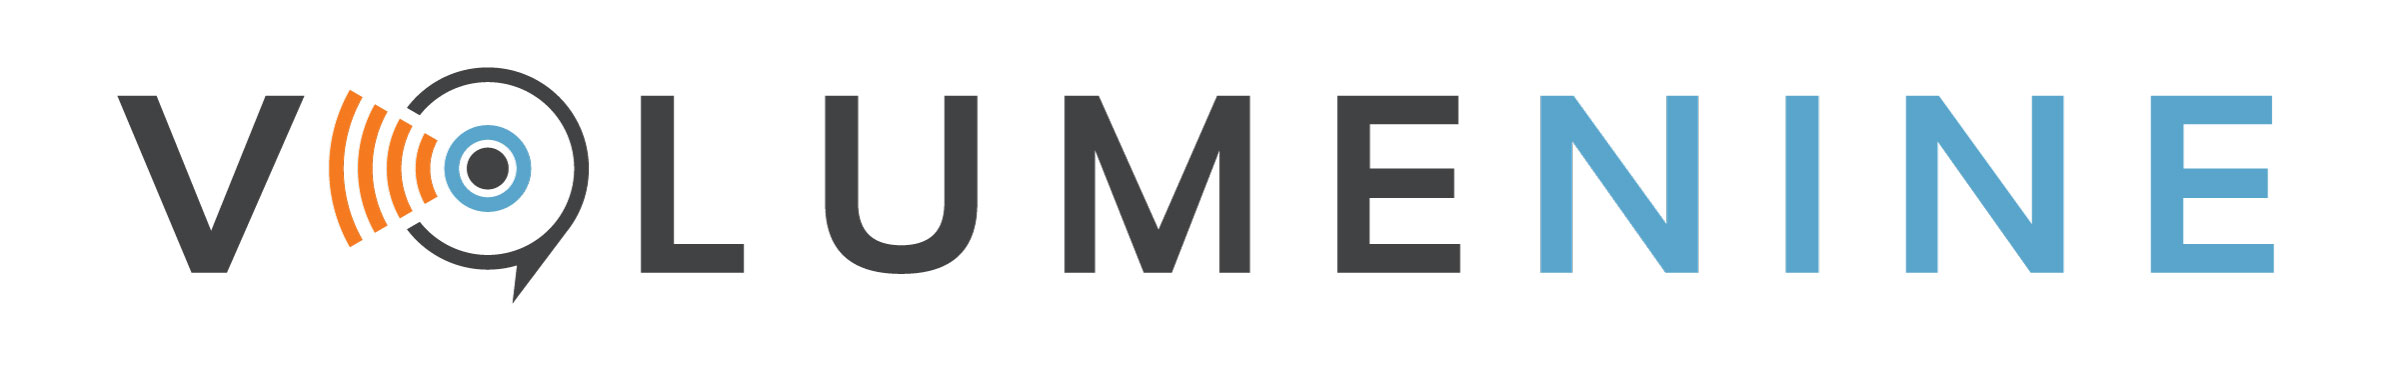 volume-nine-logo-image